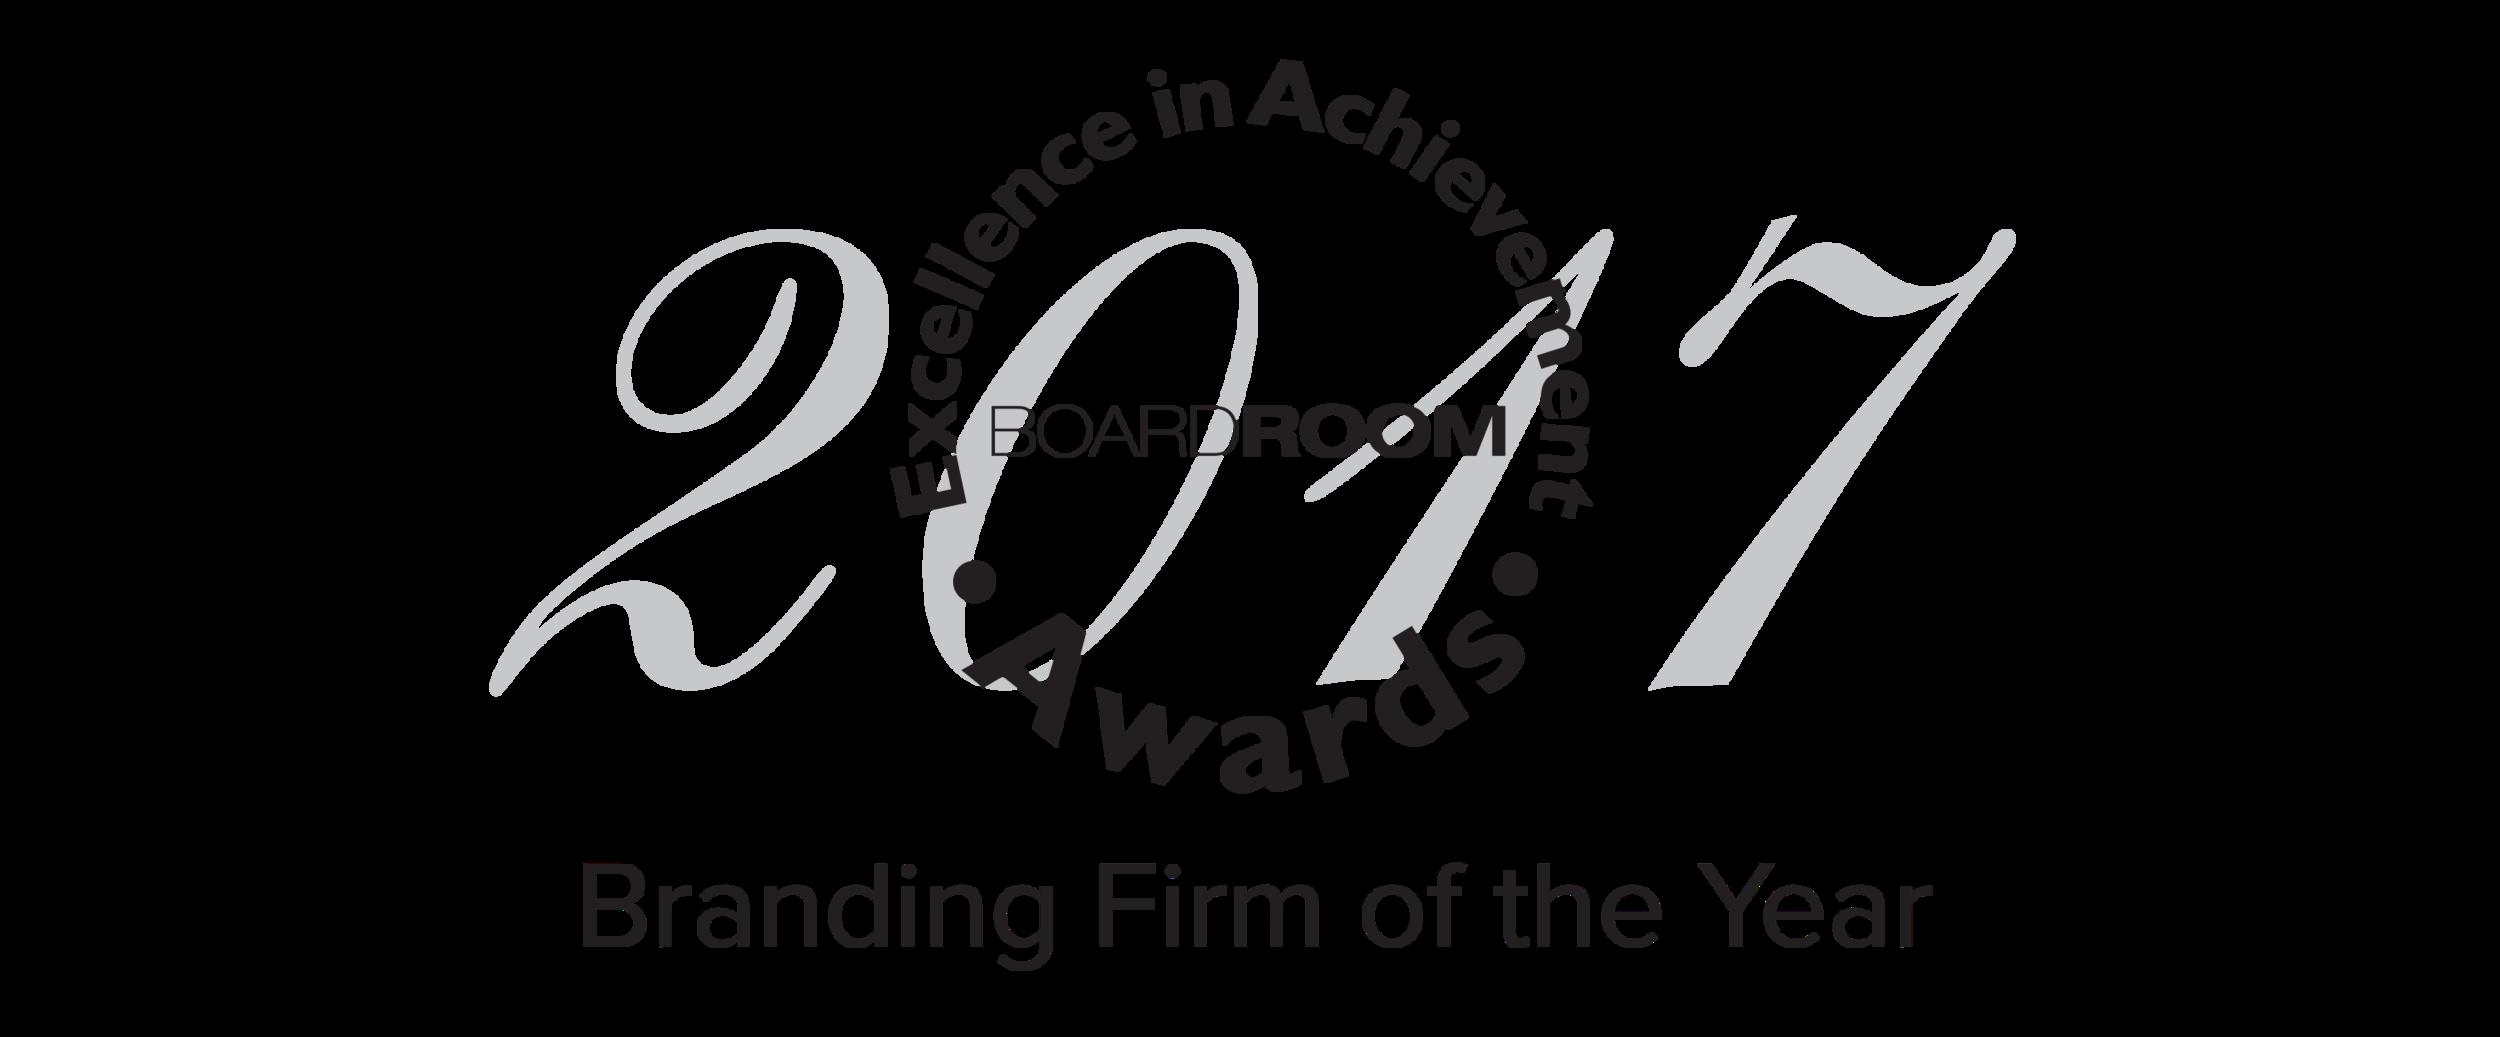 Best Branding Firm 2017 BoardRoom Awards.png